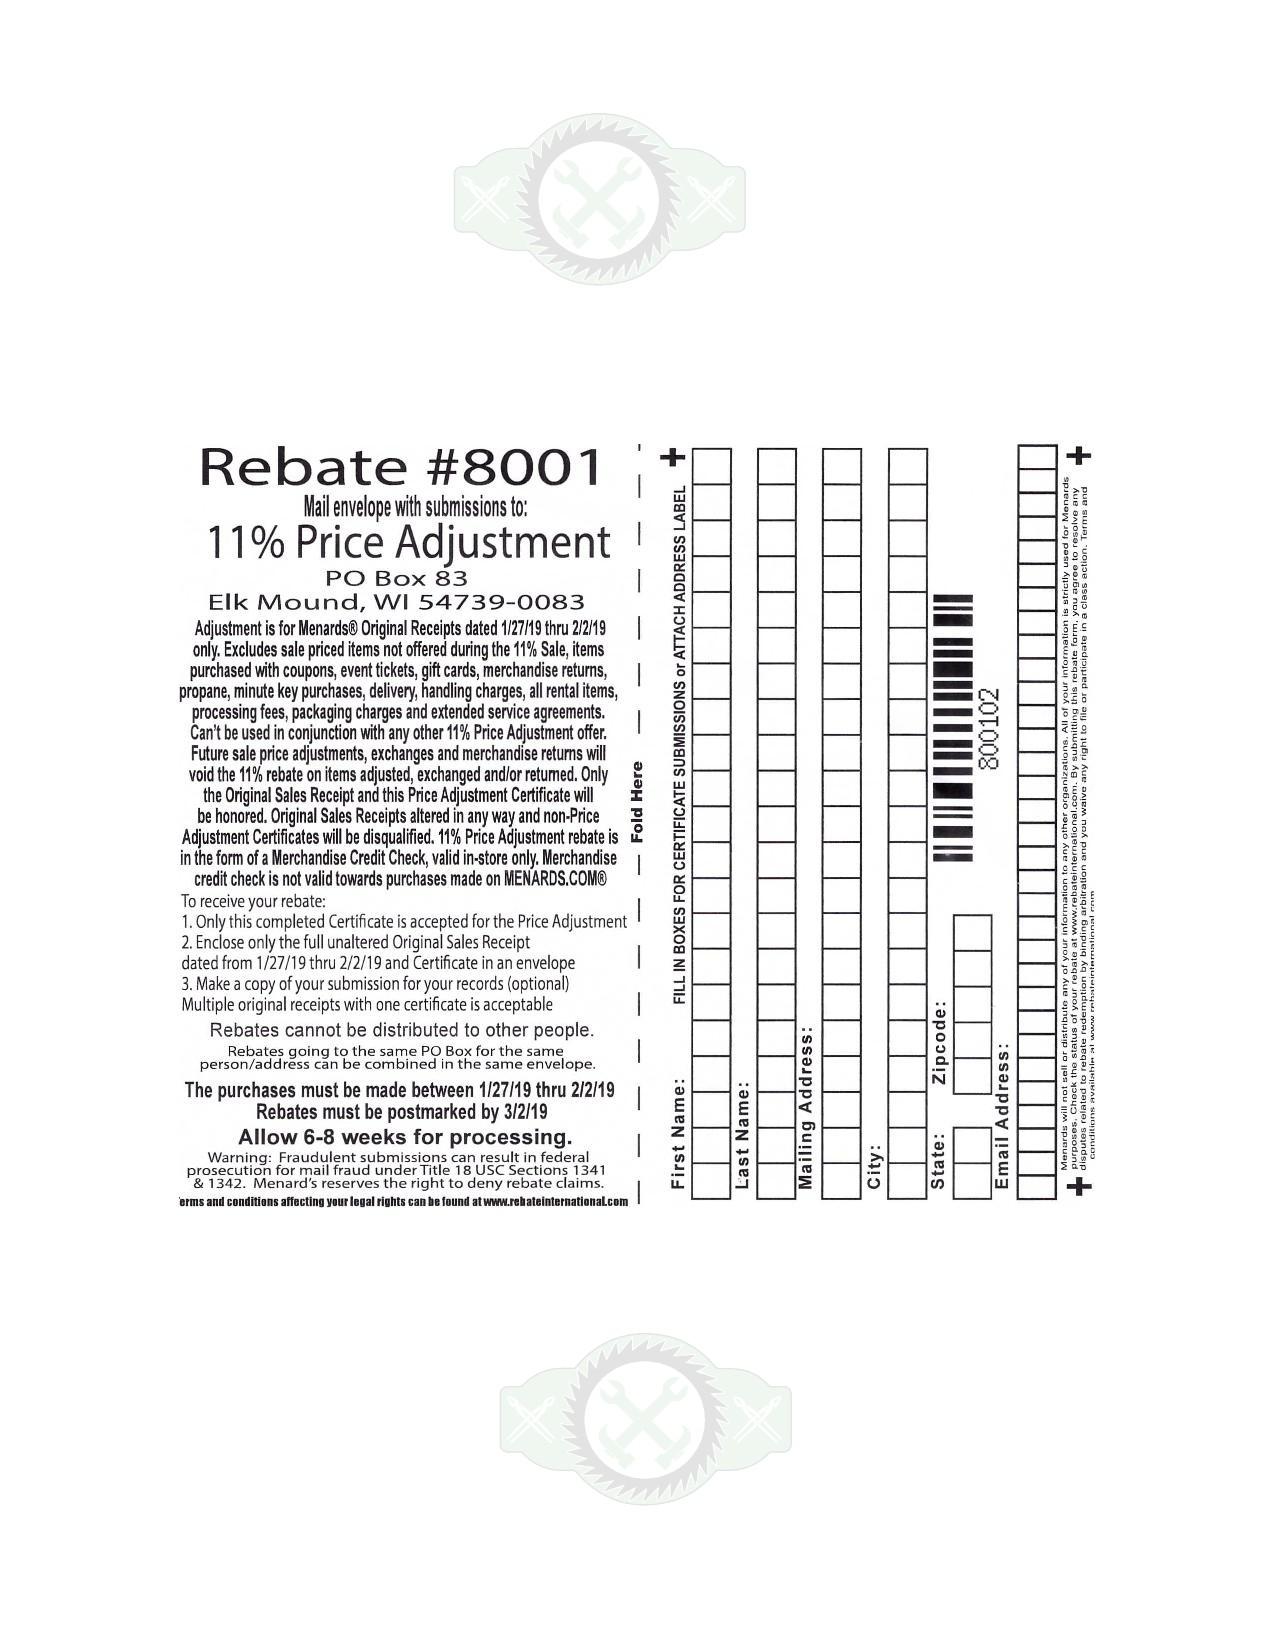 image regarding Menards Printable Coupons named Menards 11% Cost Adjustment Rebate #8001 Buys 1/27